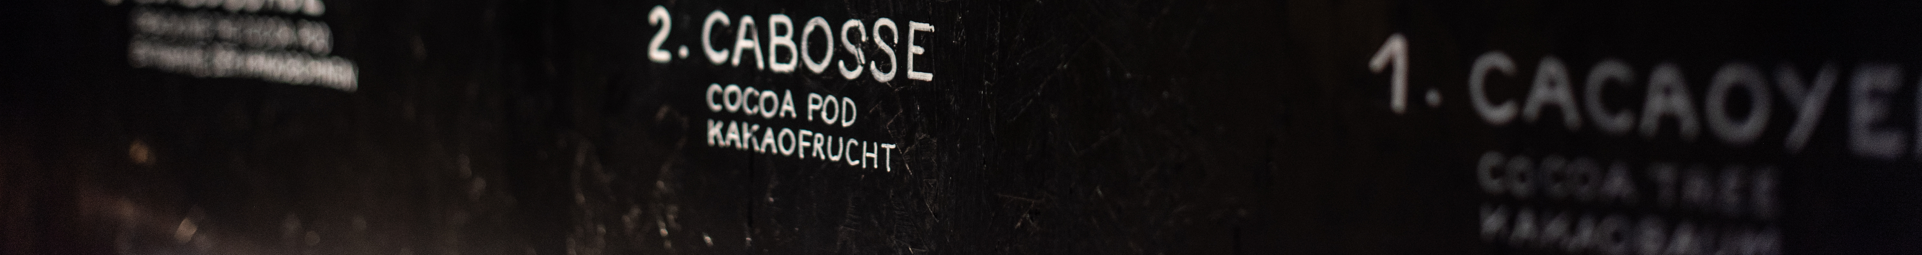 "The restaurant ""Les Secrets des Grands Express"""